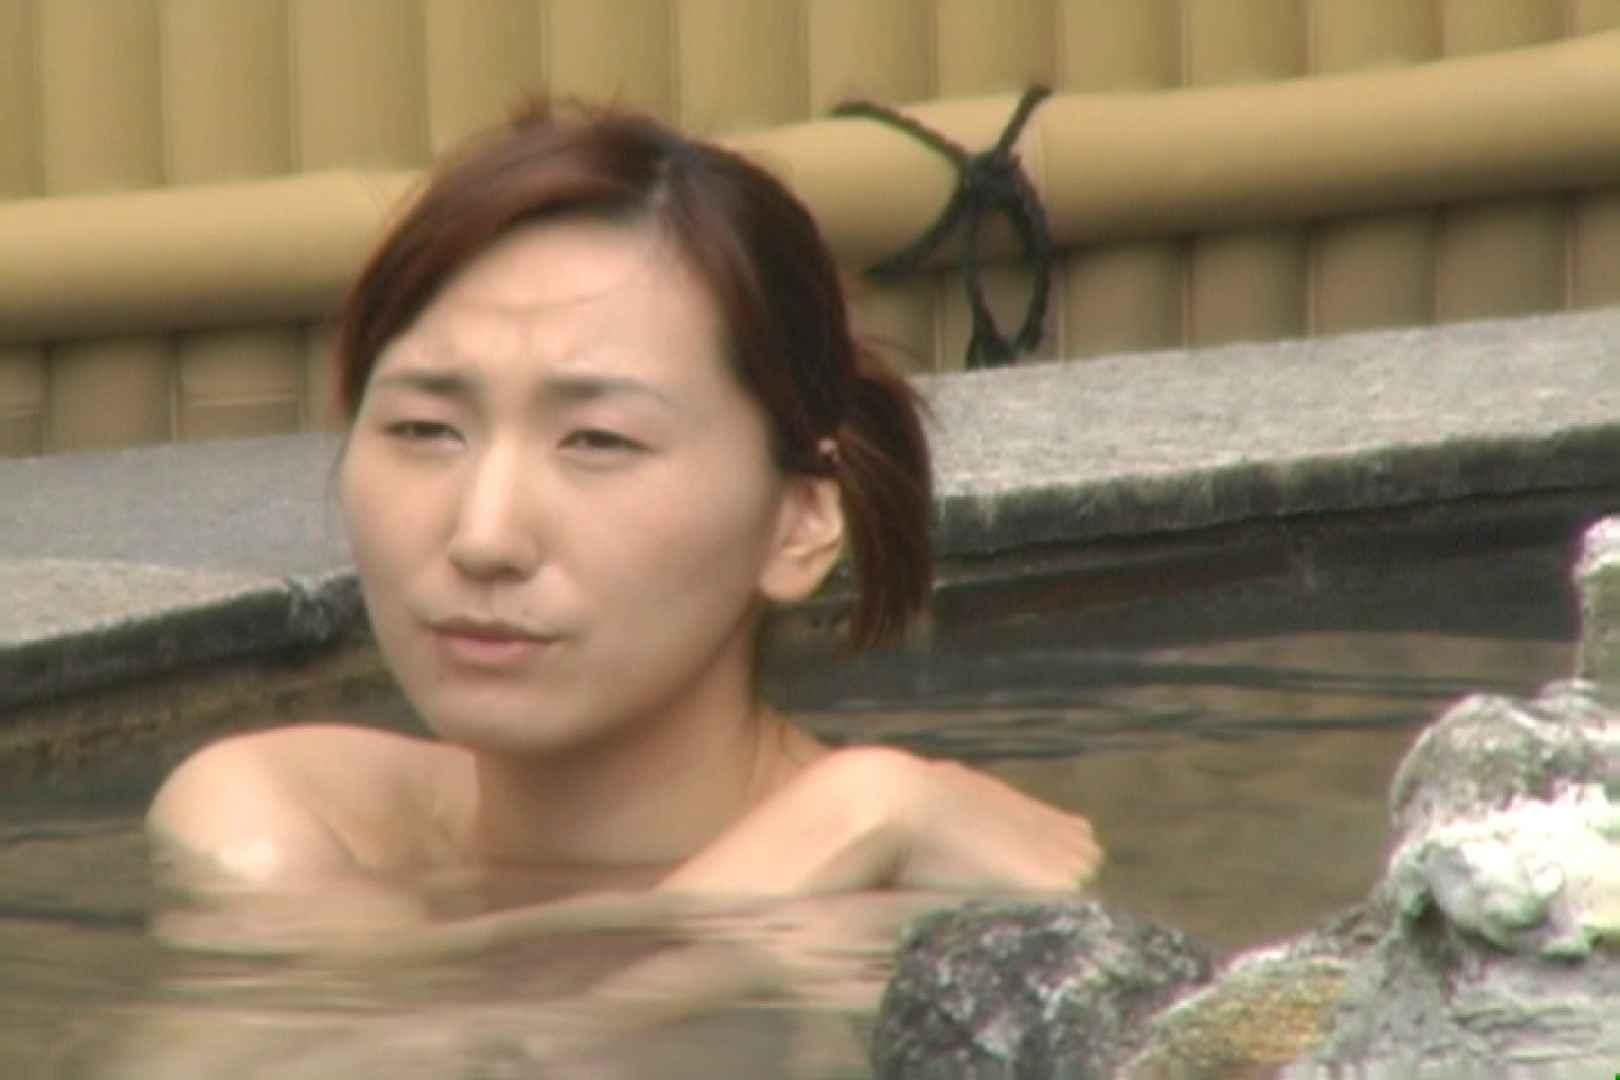 Aquaな露天風呂Vol.616 露天   OLセックス  99画像 34